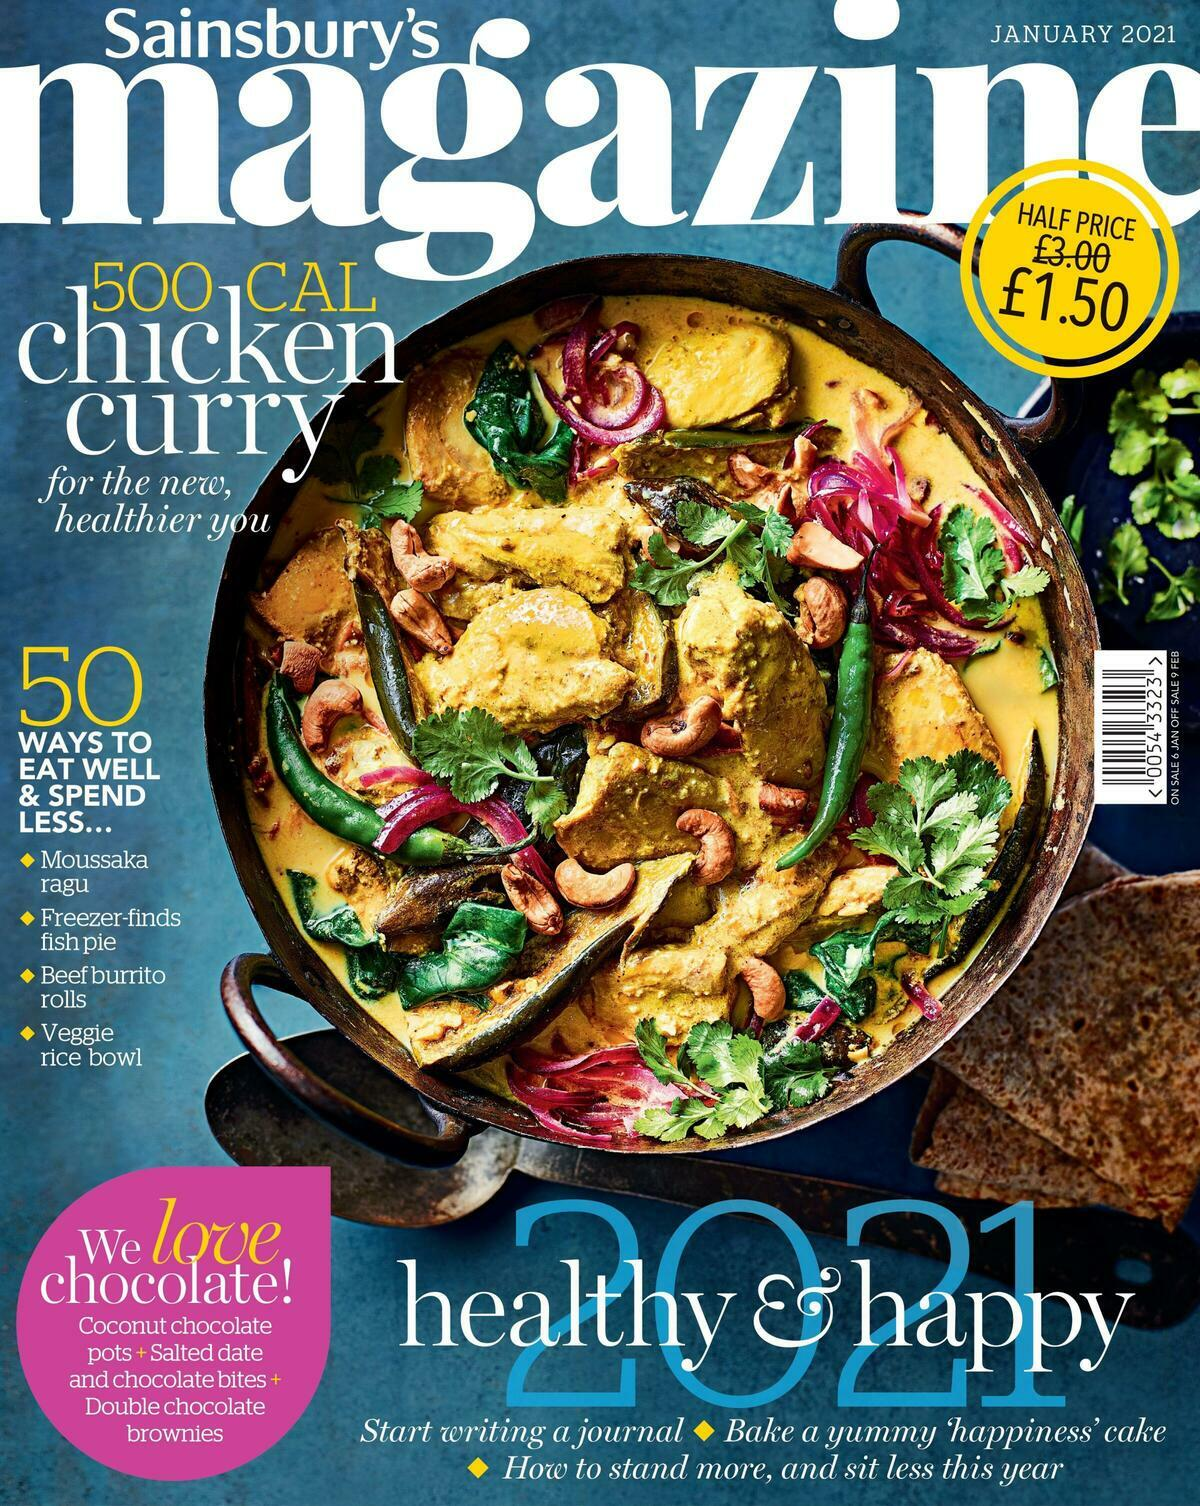 Sainsbury's Magazine January Offers from January 6